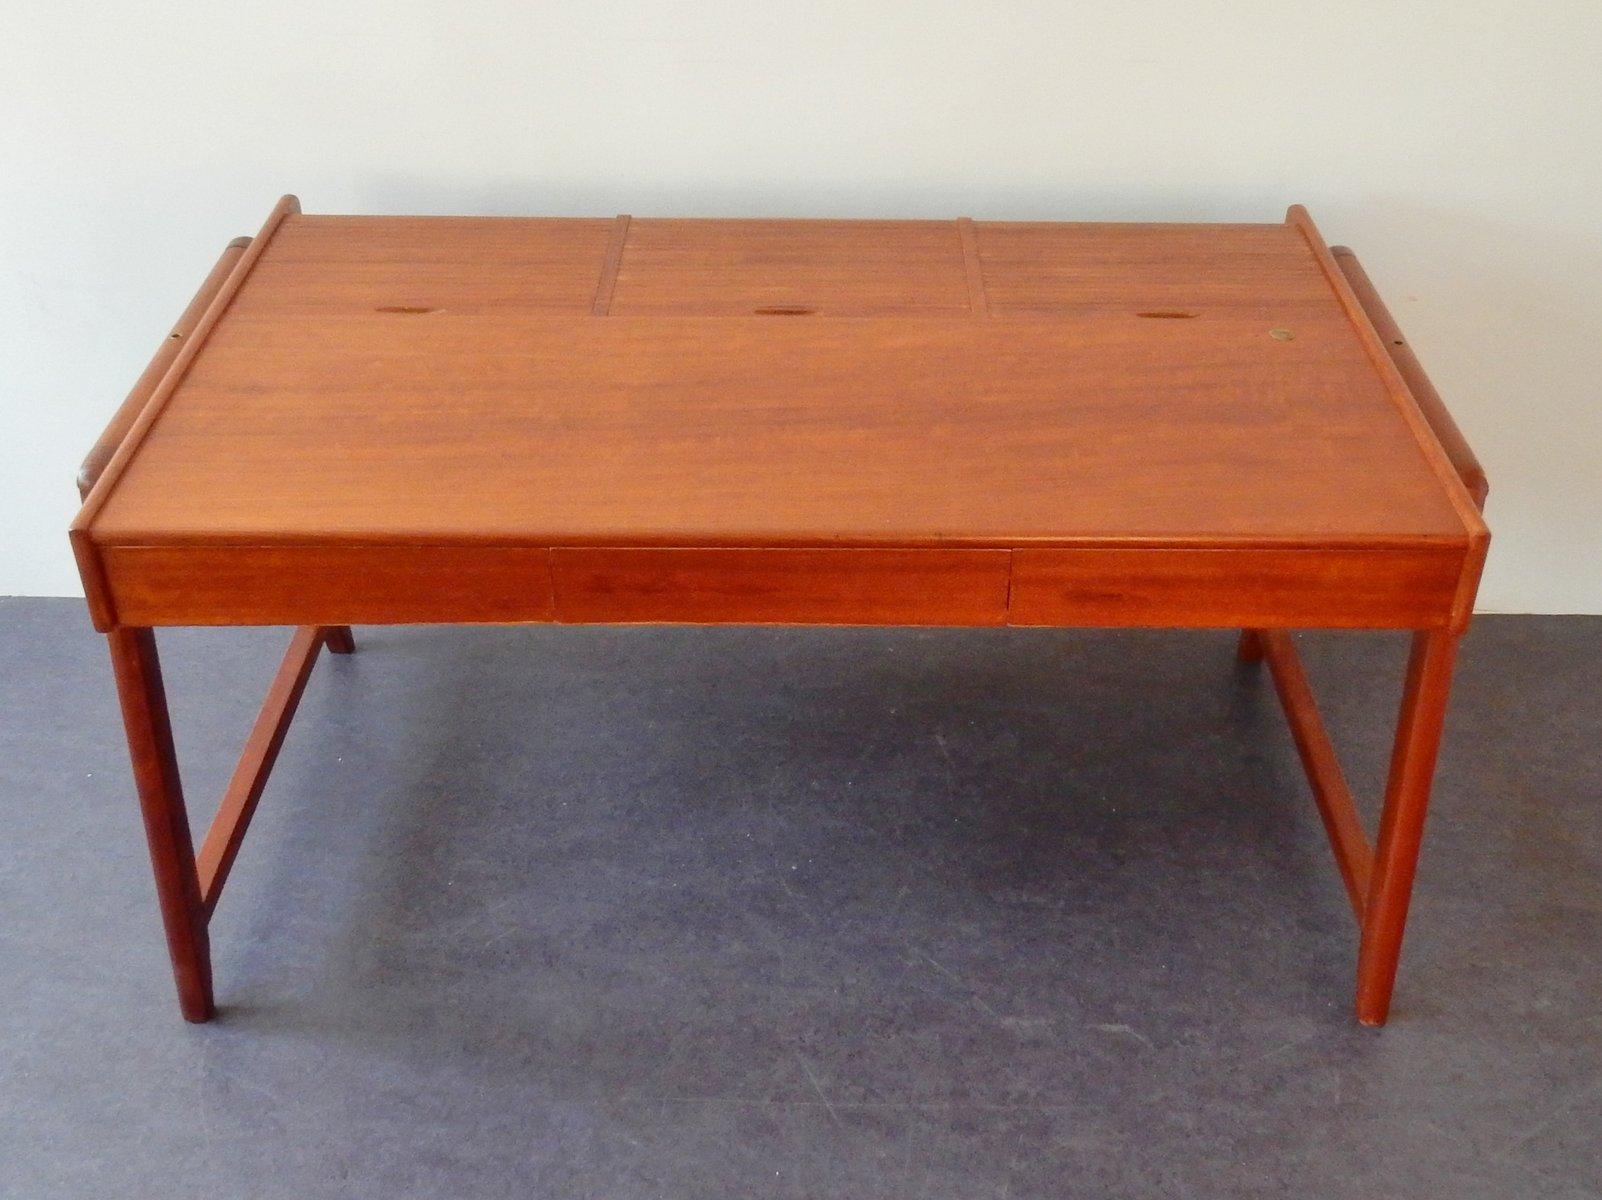 vintage mahogany desk by clausen and maerus - Mahogany Desk